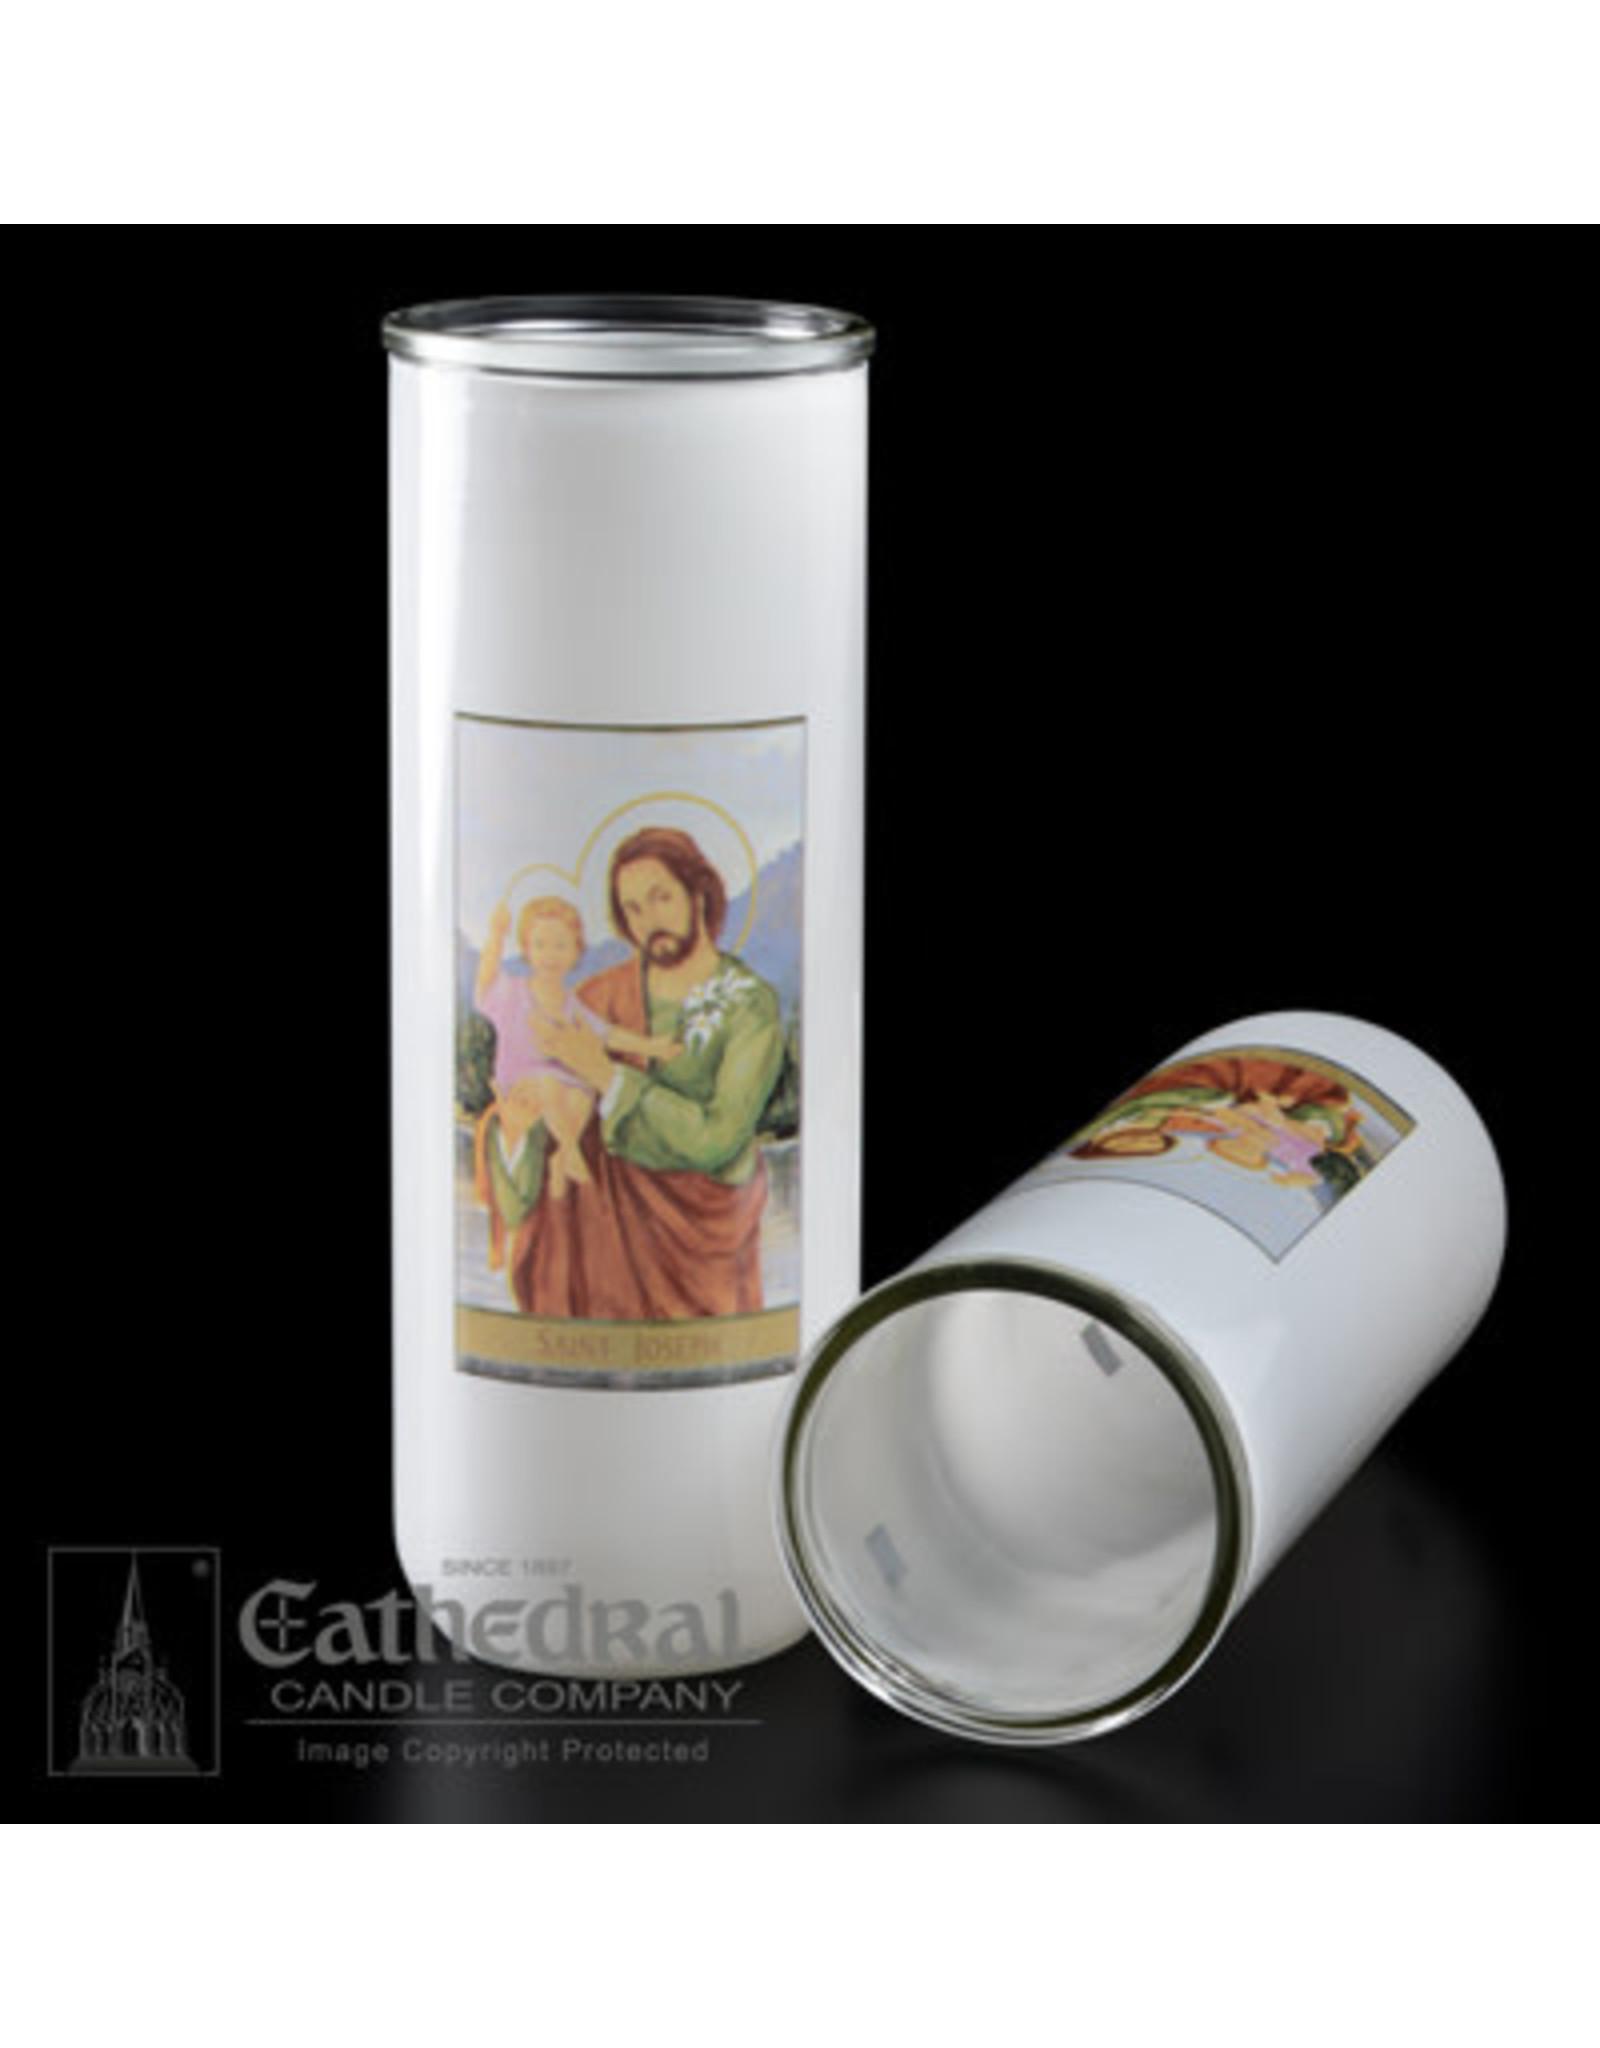 5, 6, 7-Day Glass Globe - St. Joseph